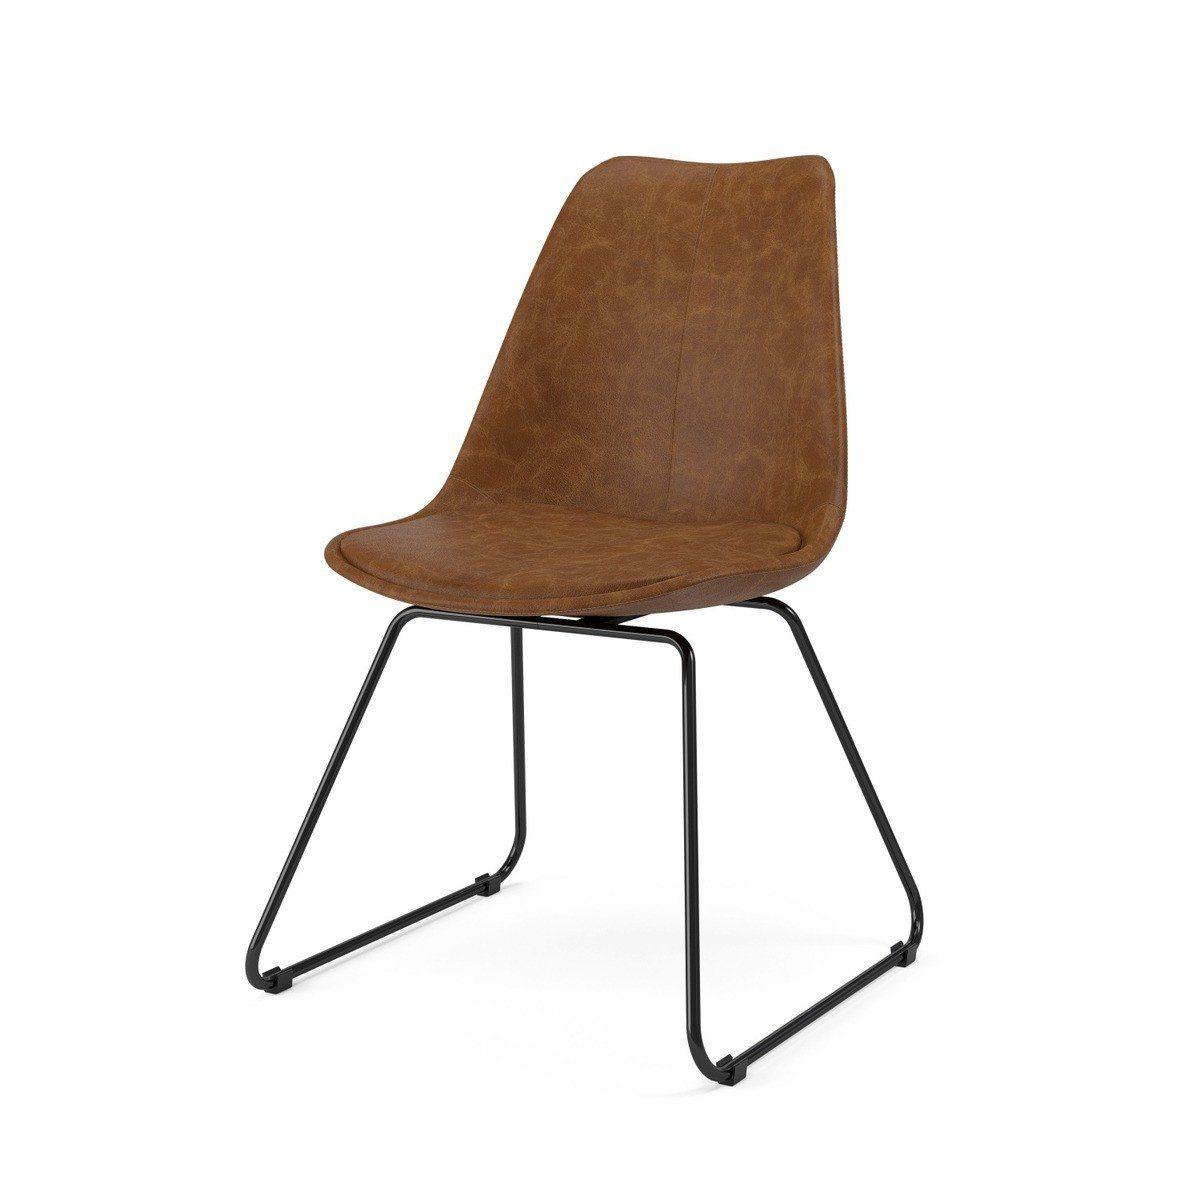 stuhl braun perfect stuhl braun gepolstert in farben stuhl mit ring stuhl with stuhl braun. Black Bedroom Furniture Sets. Home Design Ideas